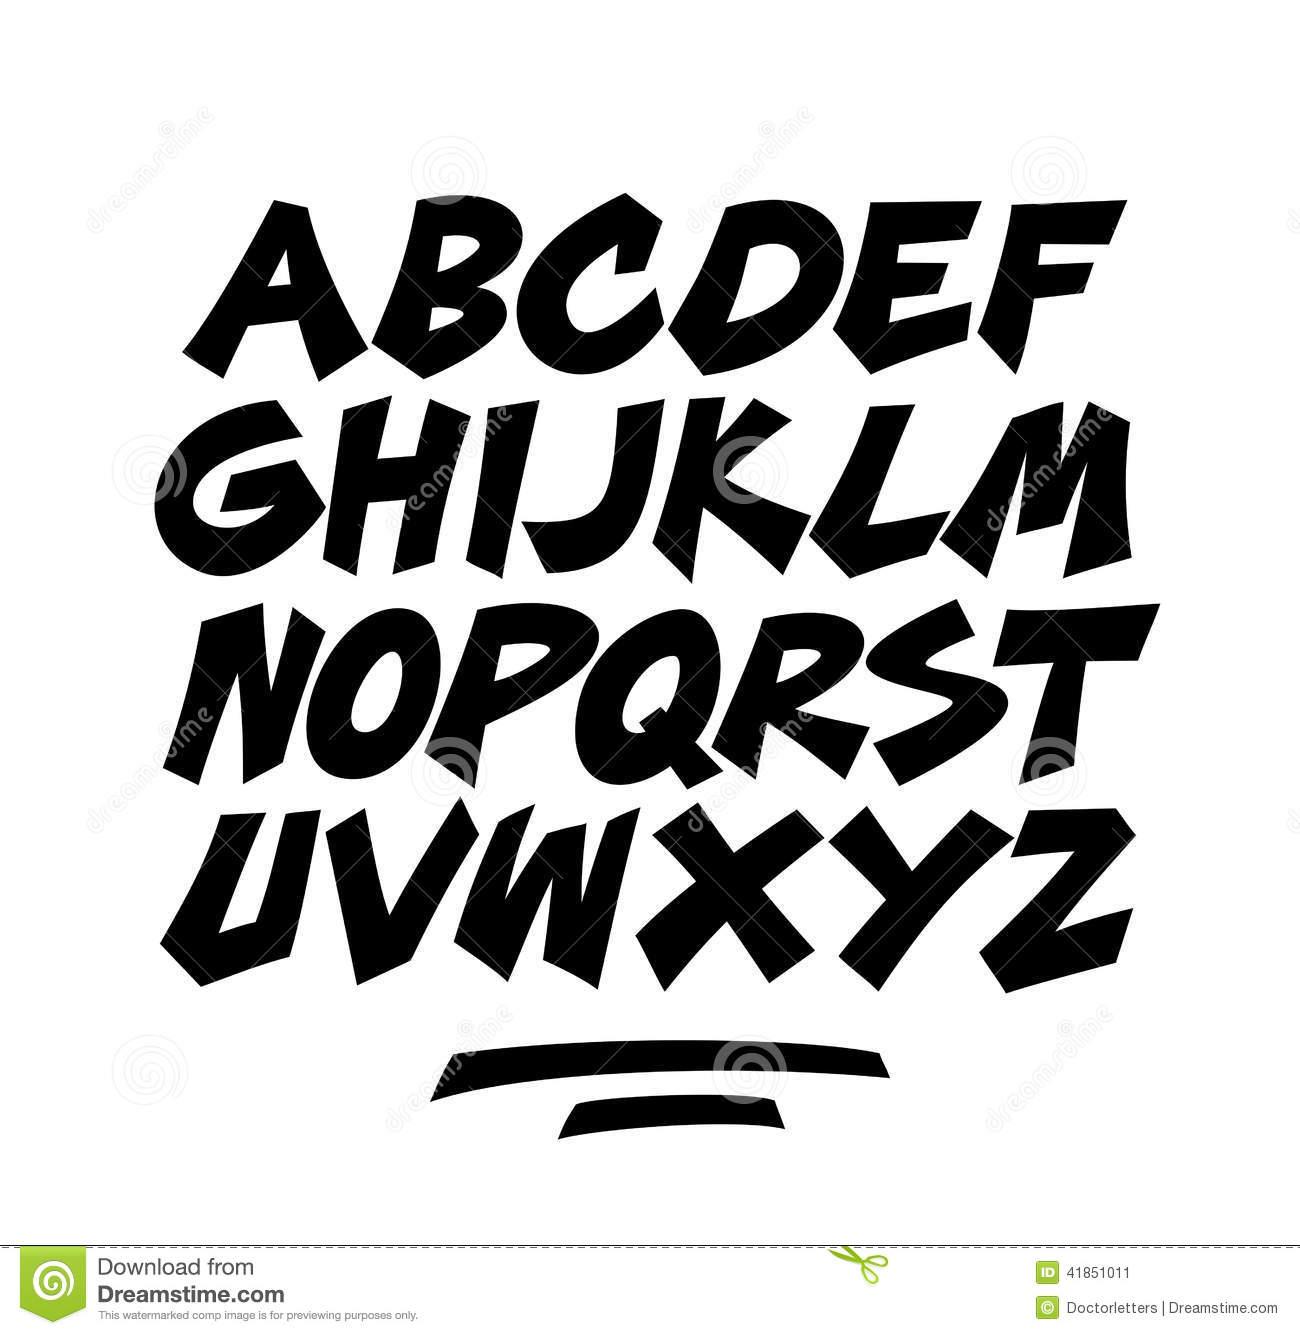 15 Free Vector Comic Cartoon Font Alphabet Doodle Images